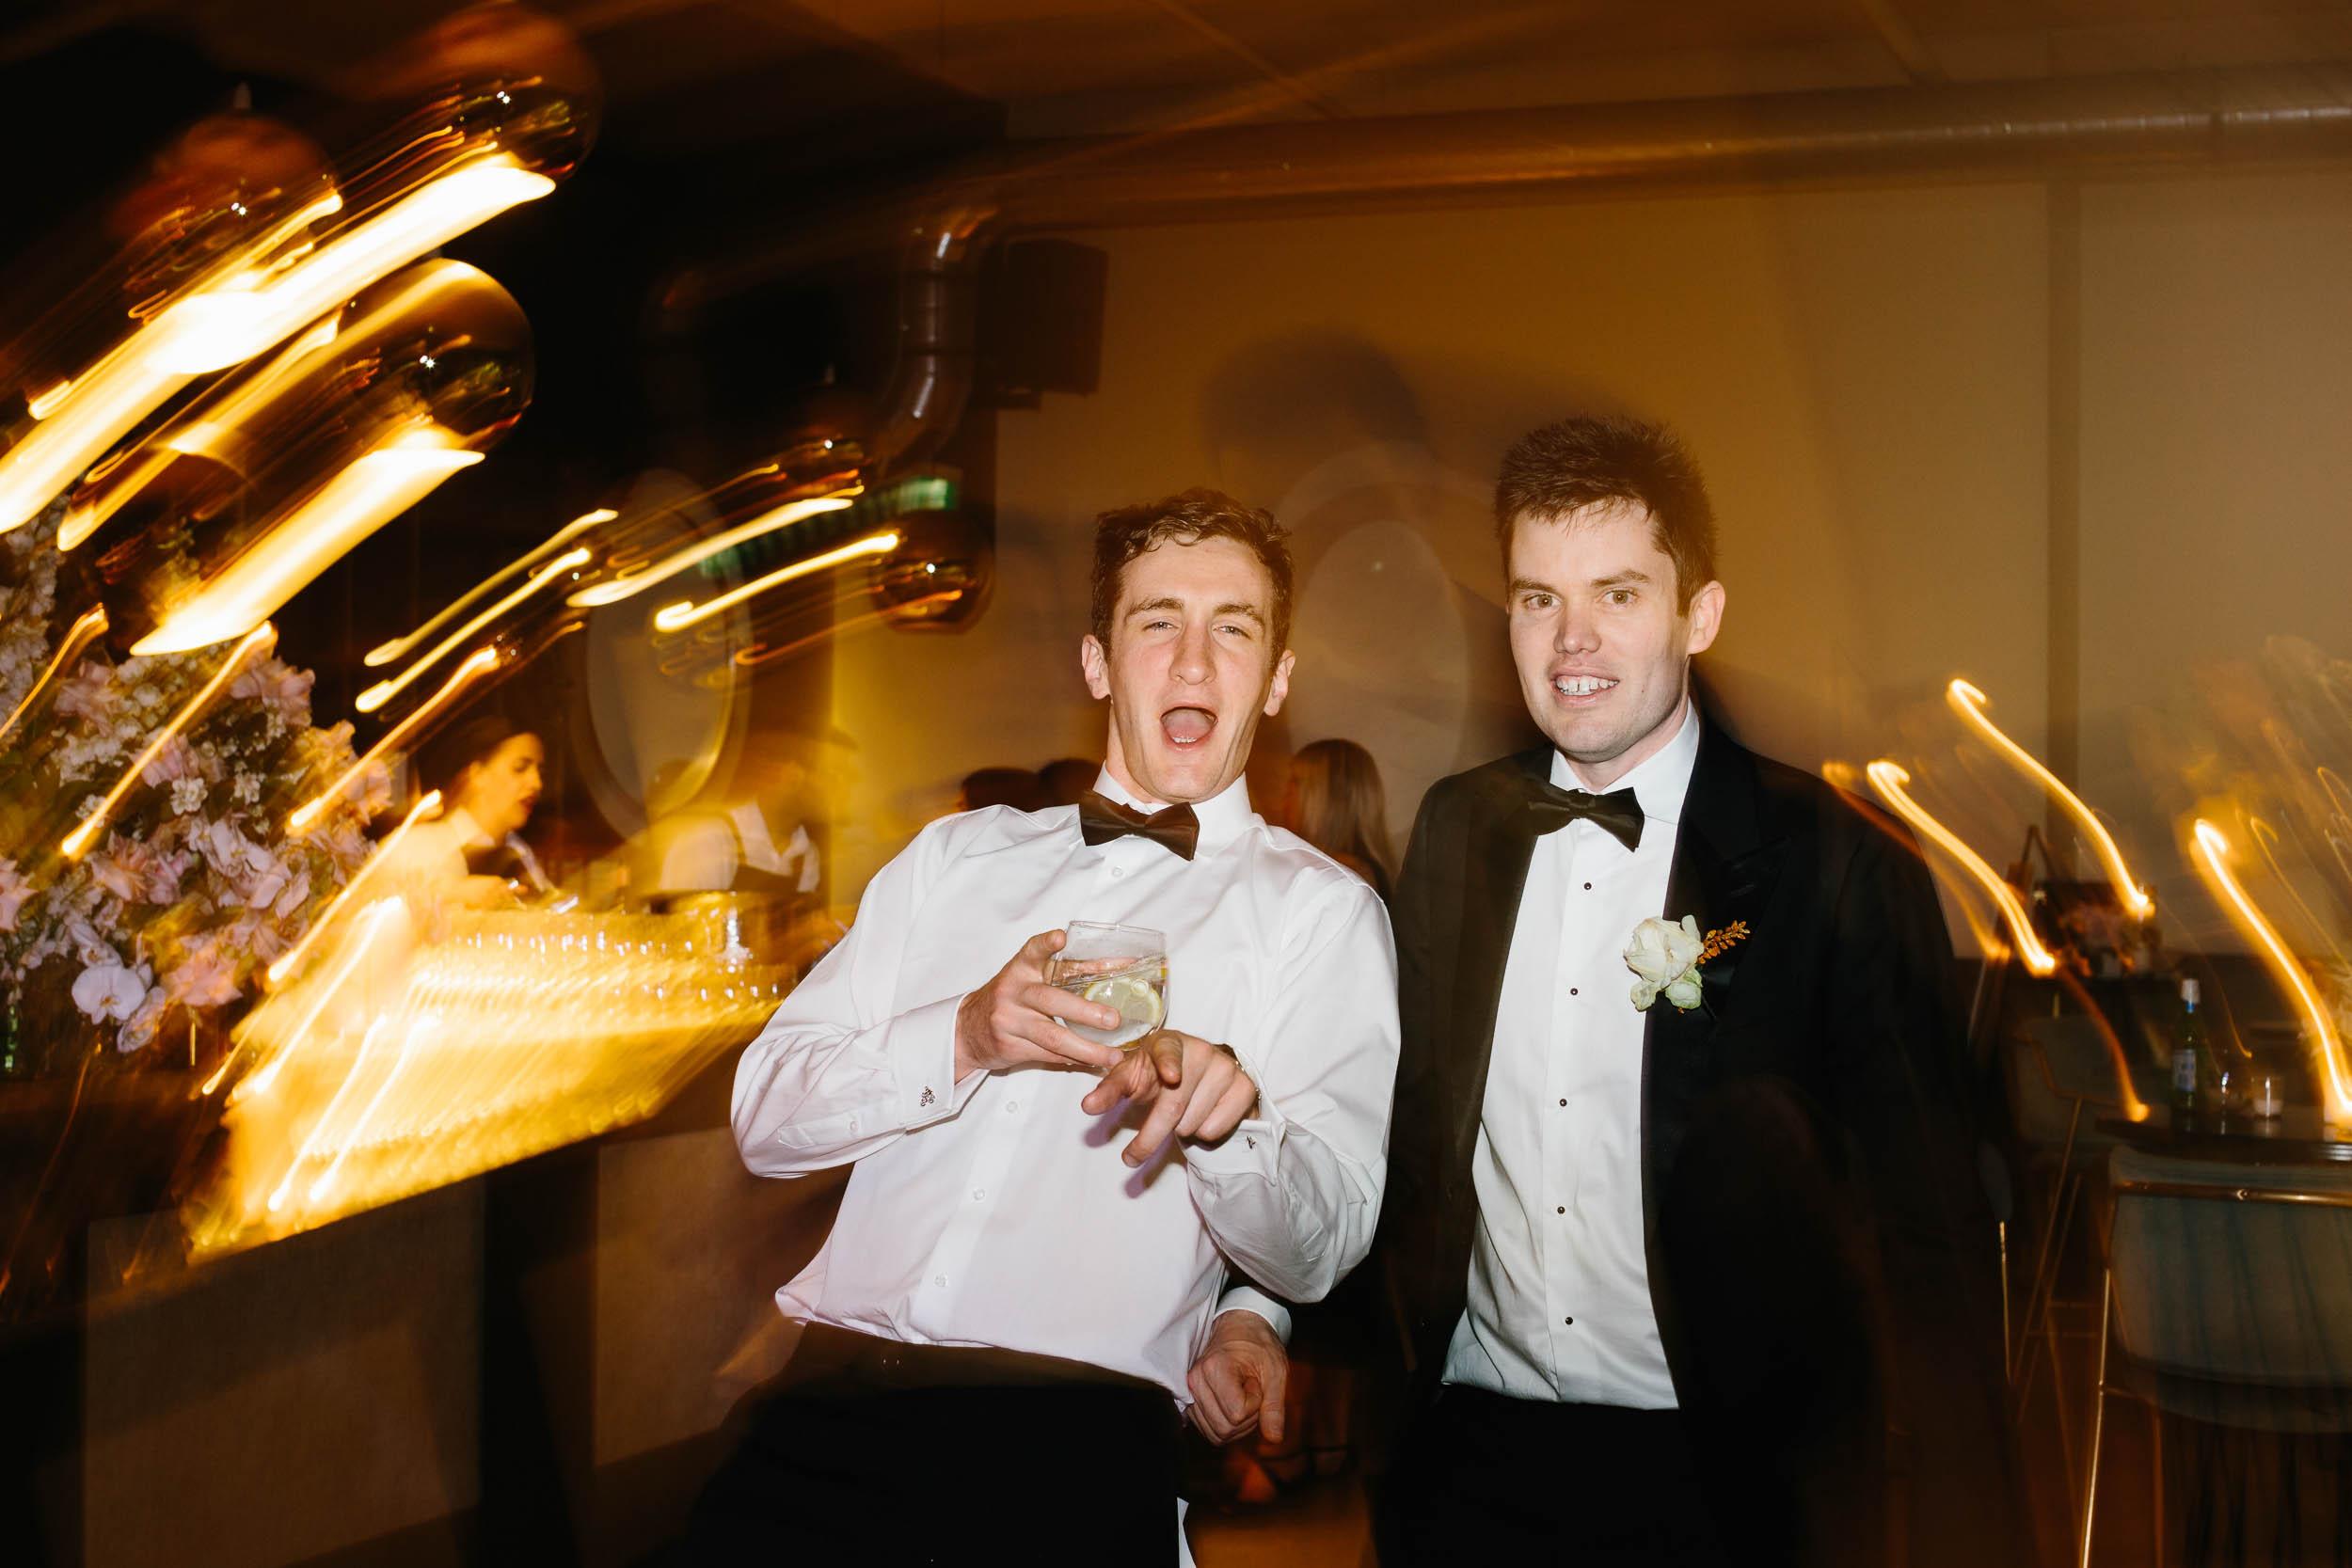 Kas-Richards-Wedding-Photographer-Melbourne-City-Wedding-Alto-Event-Space-Jane-Hill-Bridal-Gown-77.jpg